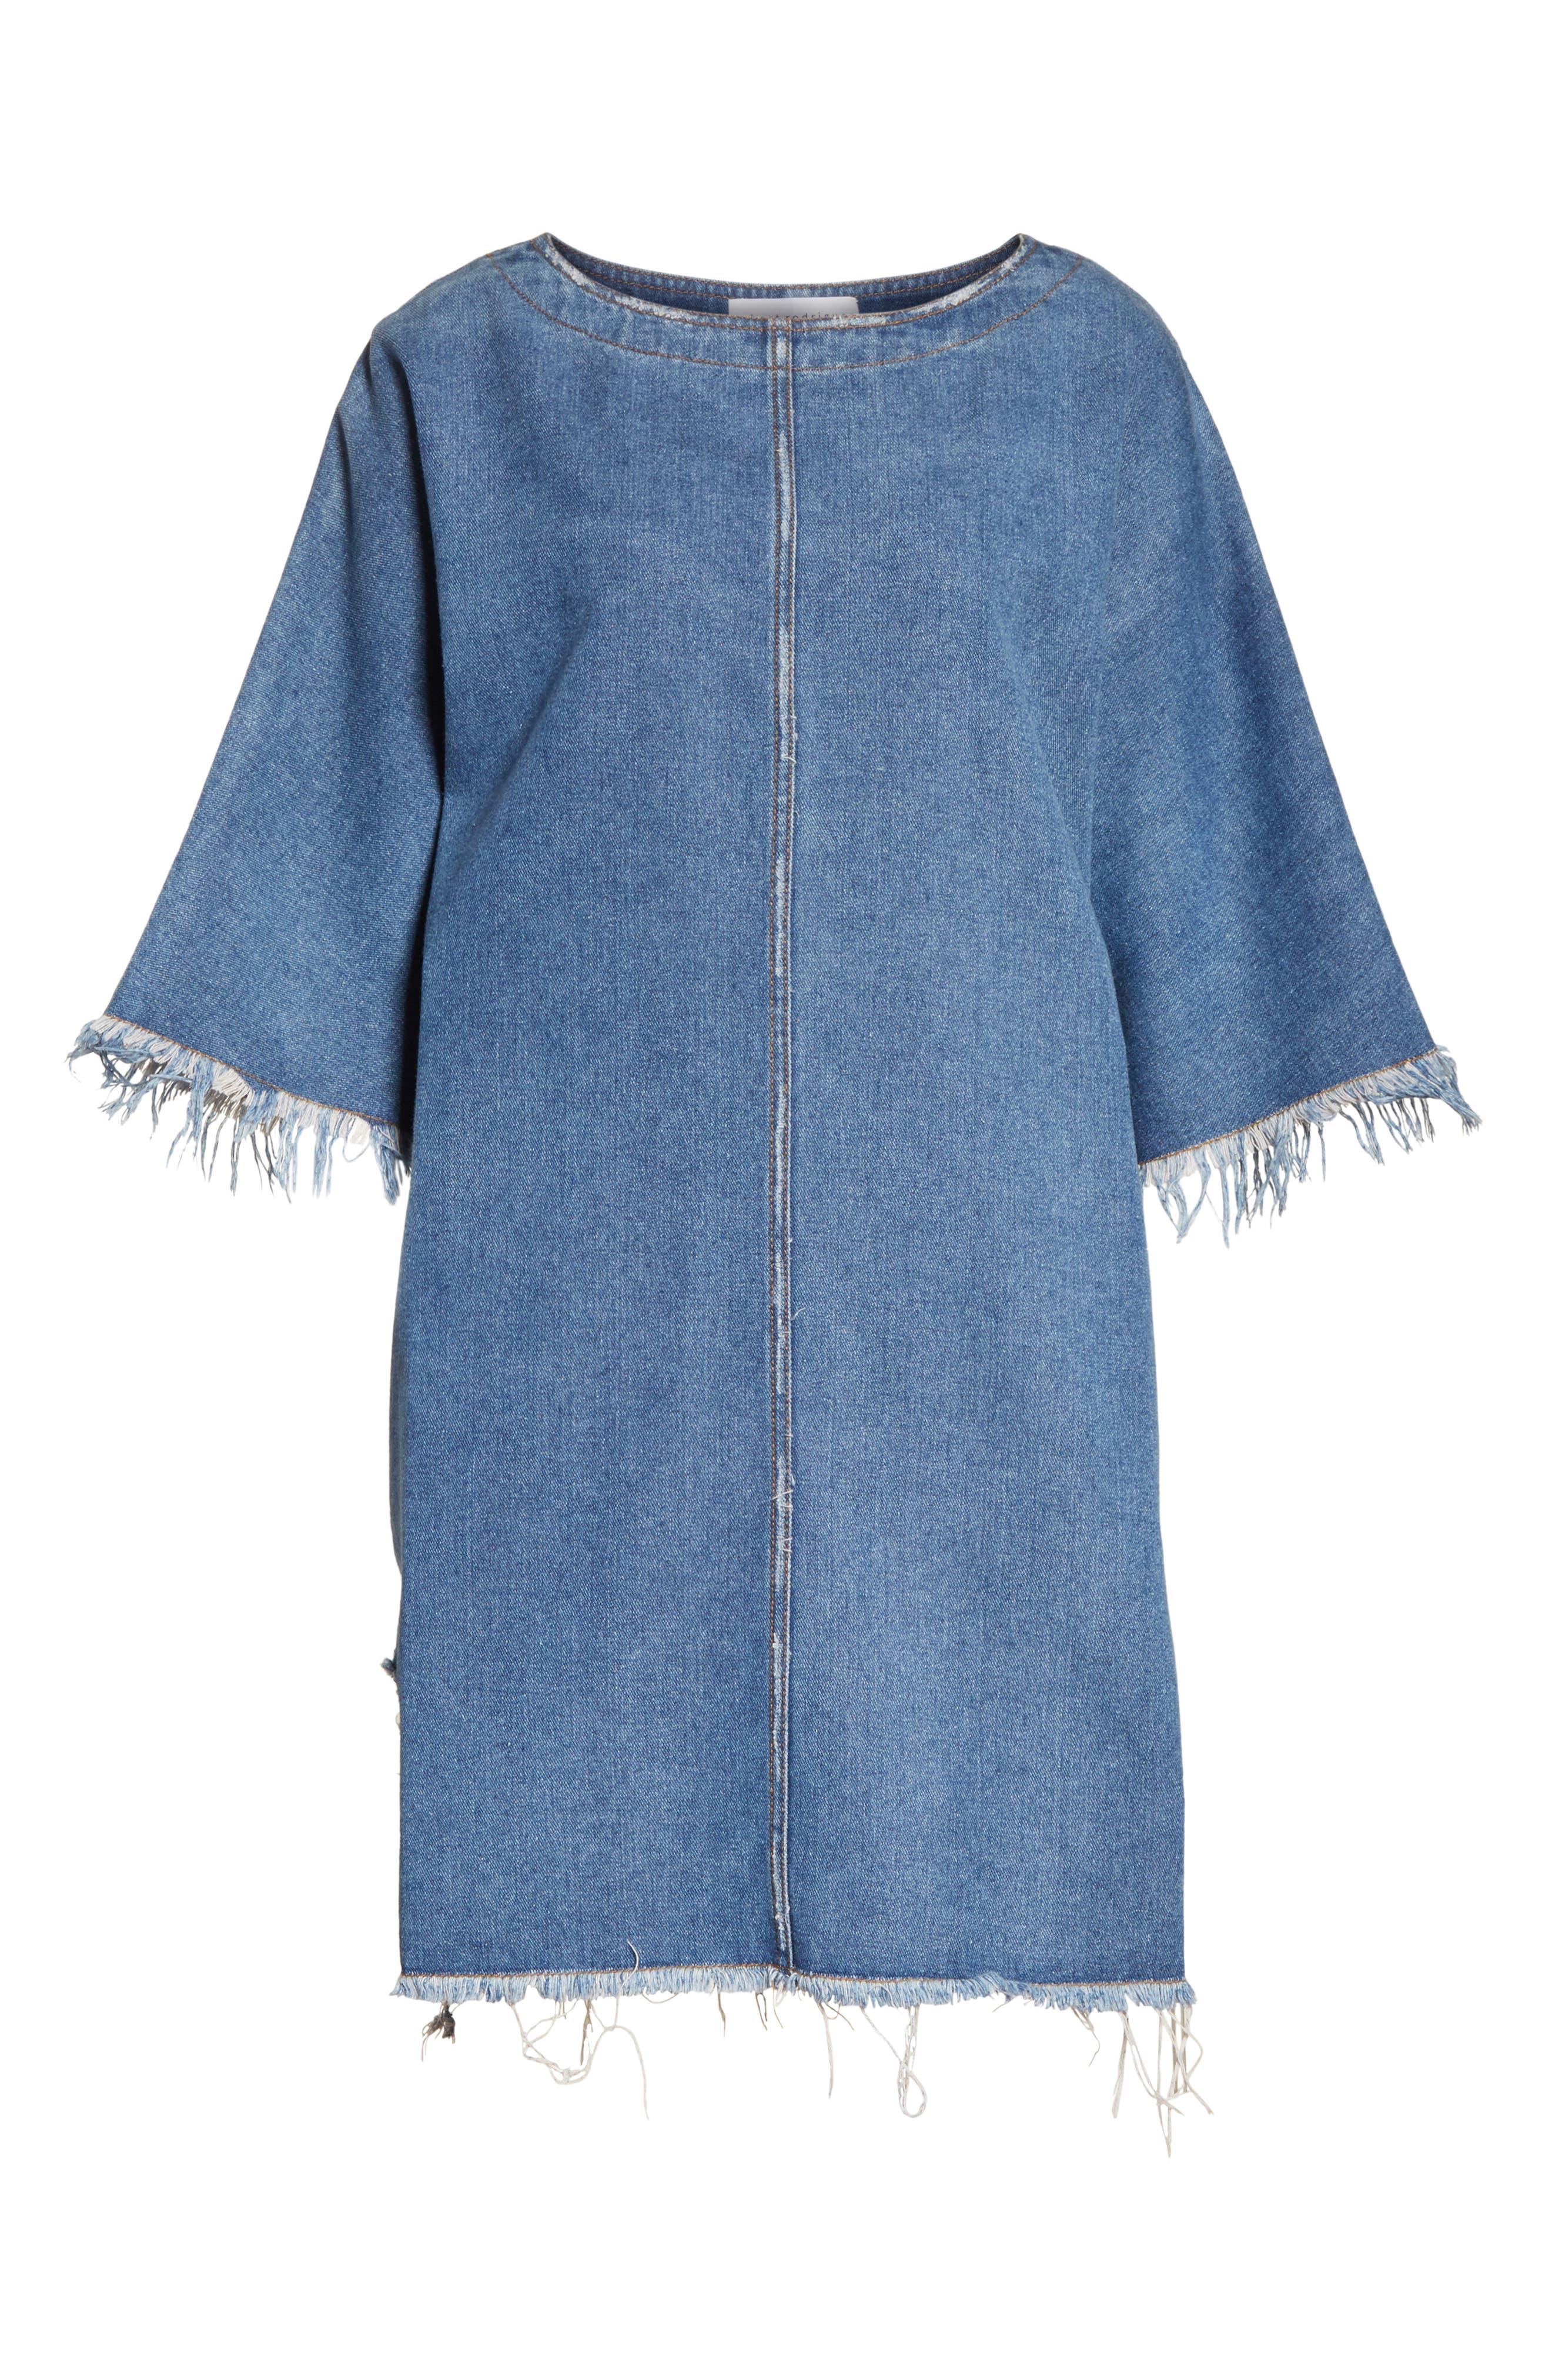 Distressed Denim Dress,                             Alternate thumbnail 6, color,                             400